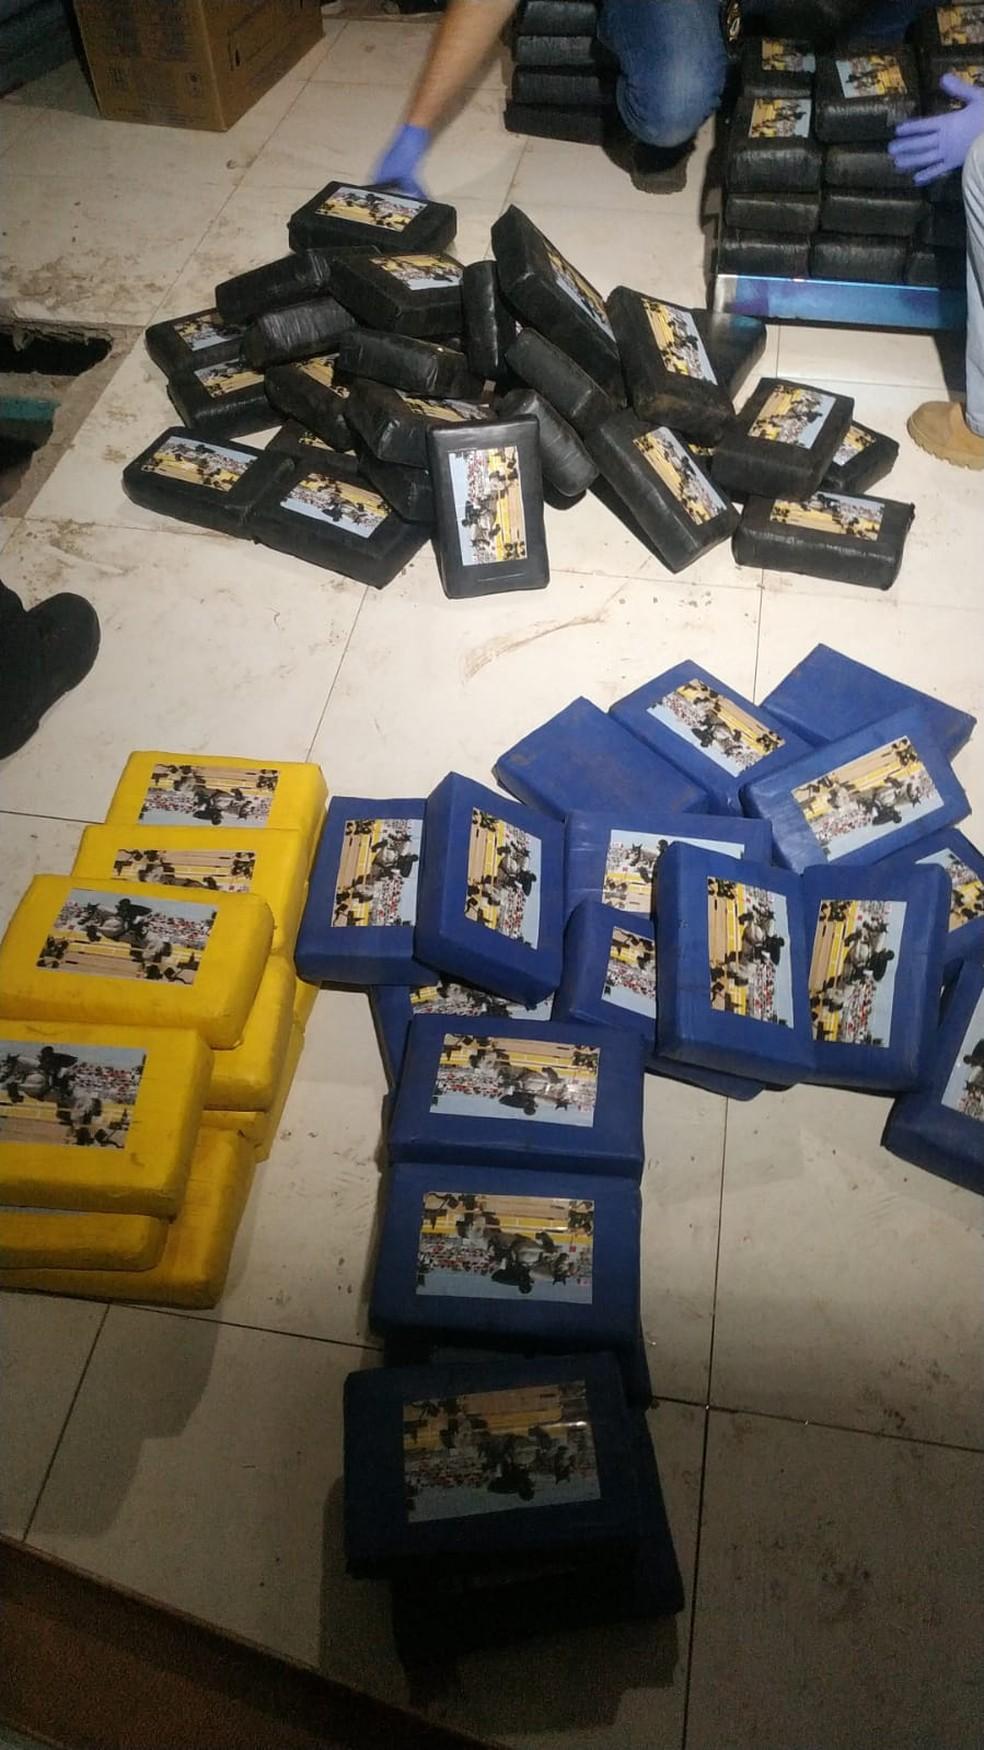 Tabletes de cocaína apreendidos em Campo Grande — Foto: Itamar Silva/TV Morena